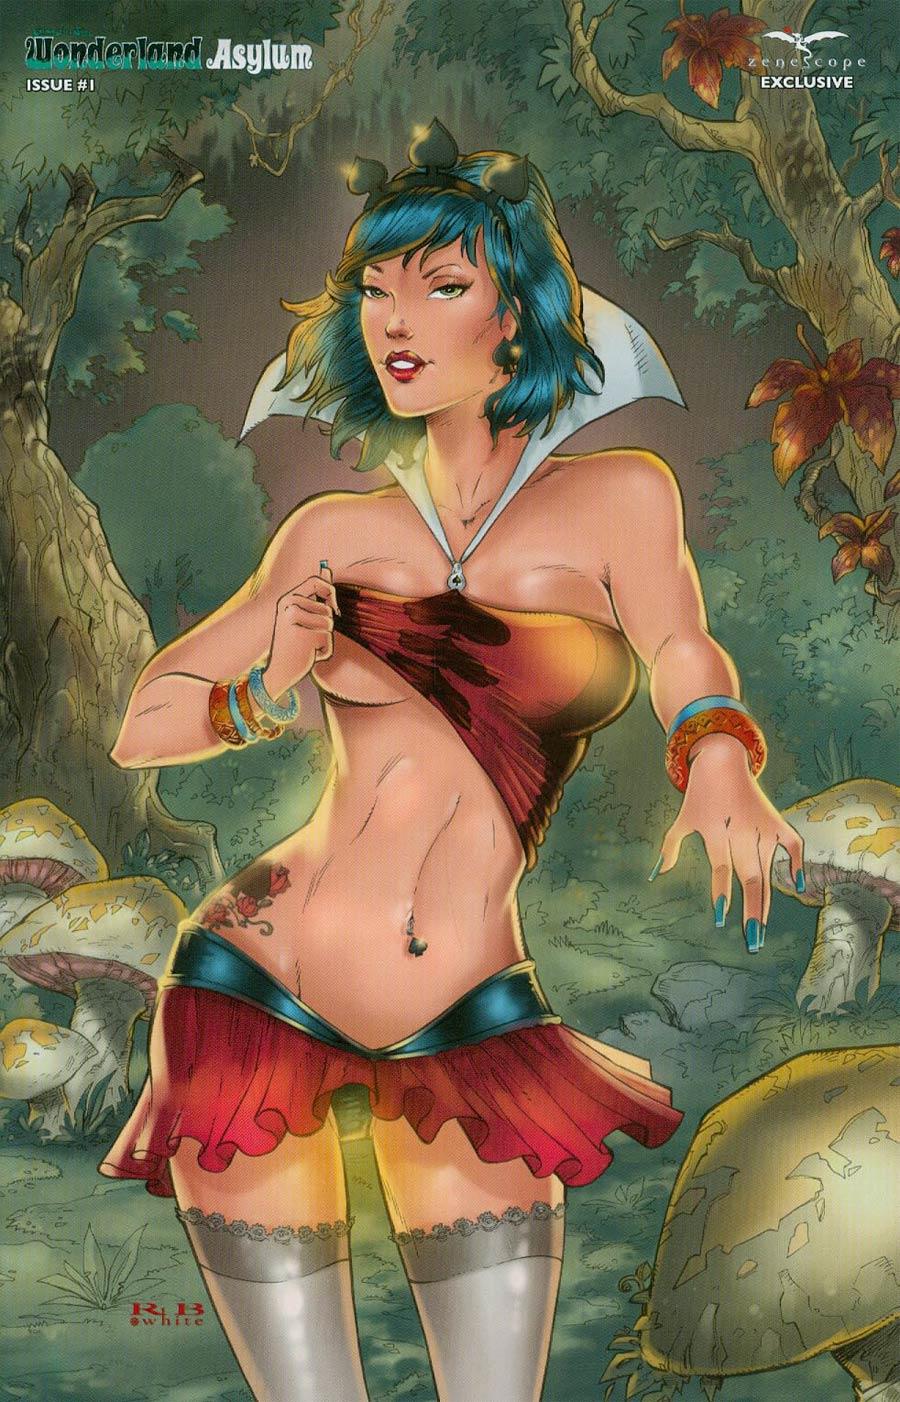 Grimm Fairy Tales Presents Wonderland Asylum #1 Cover E